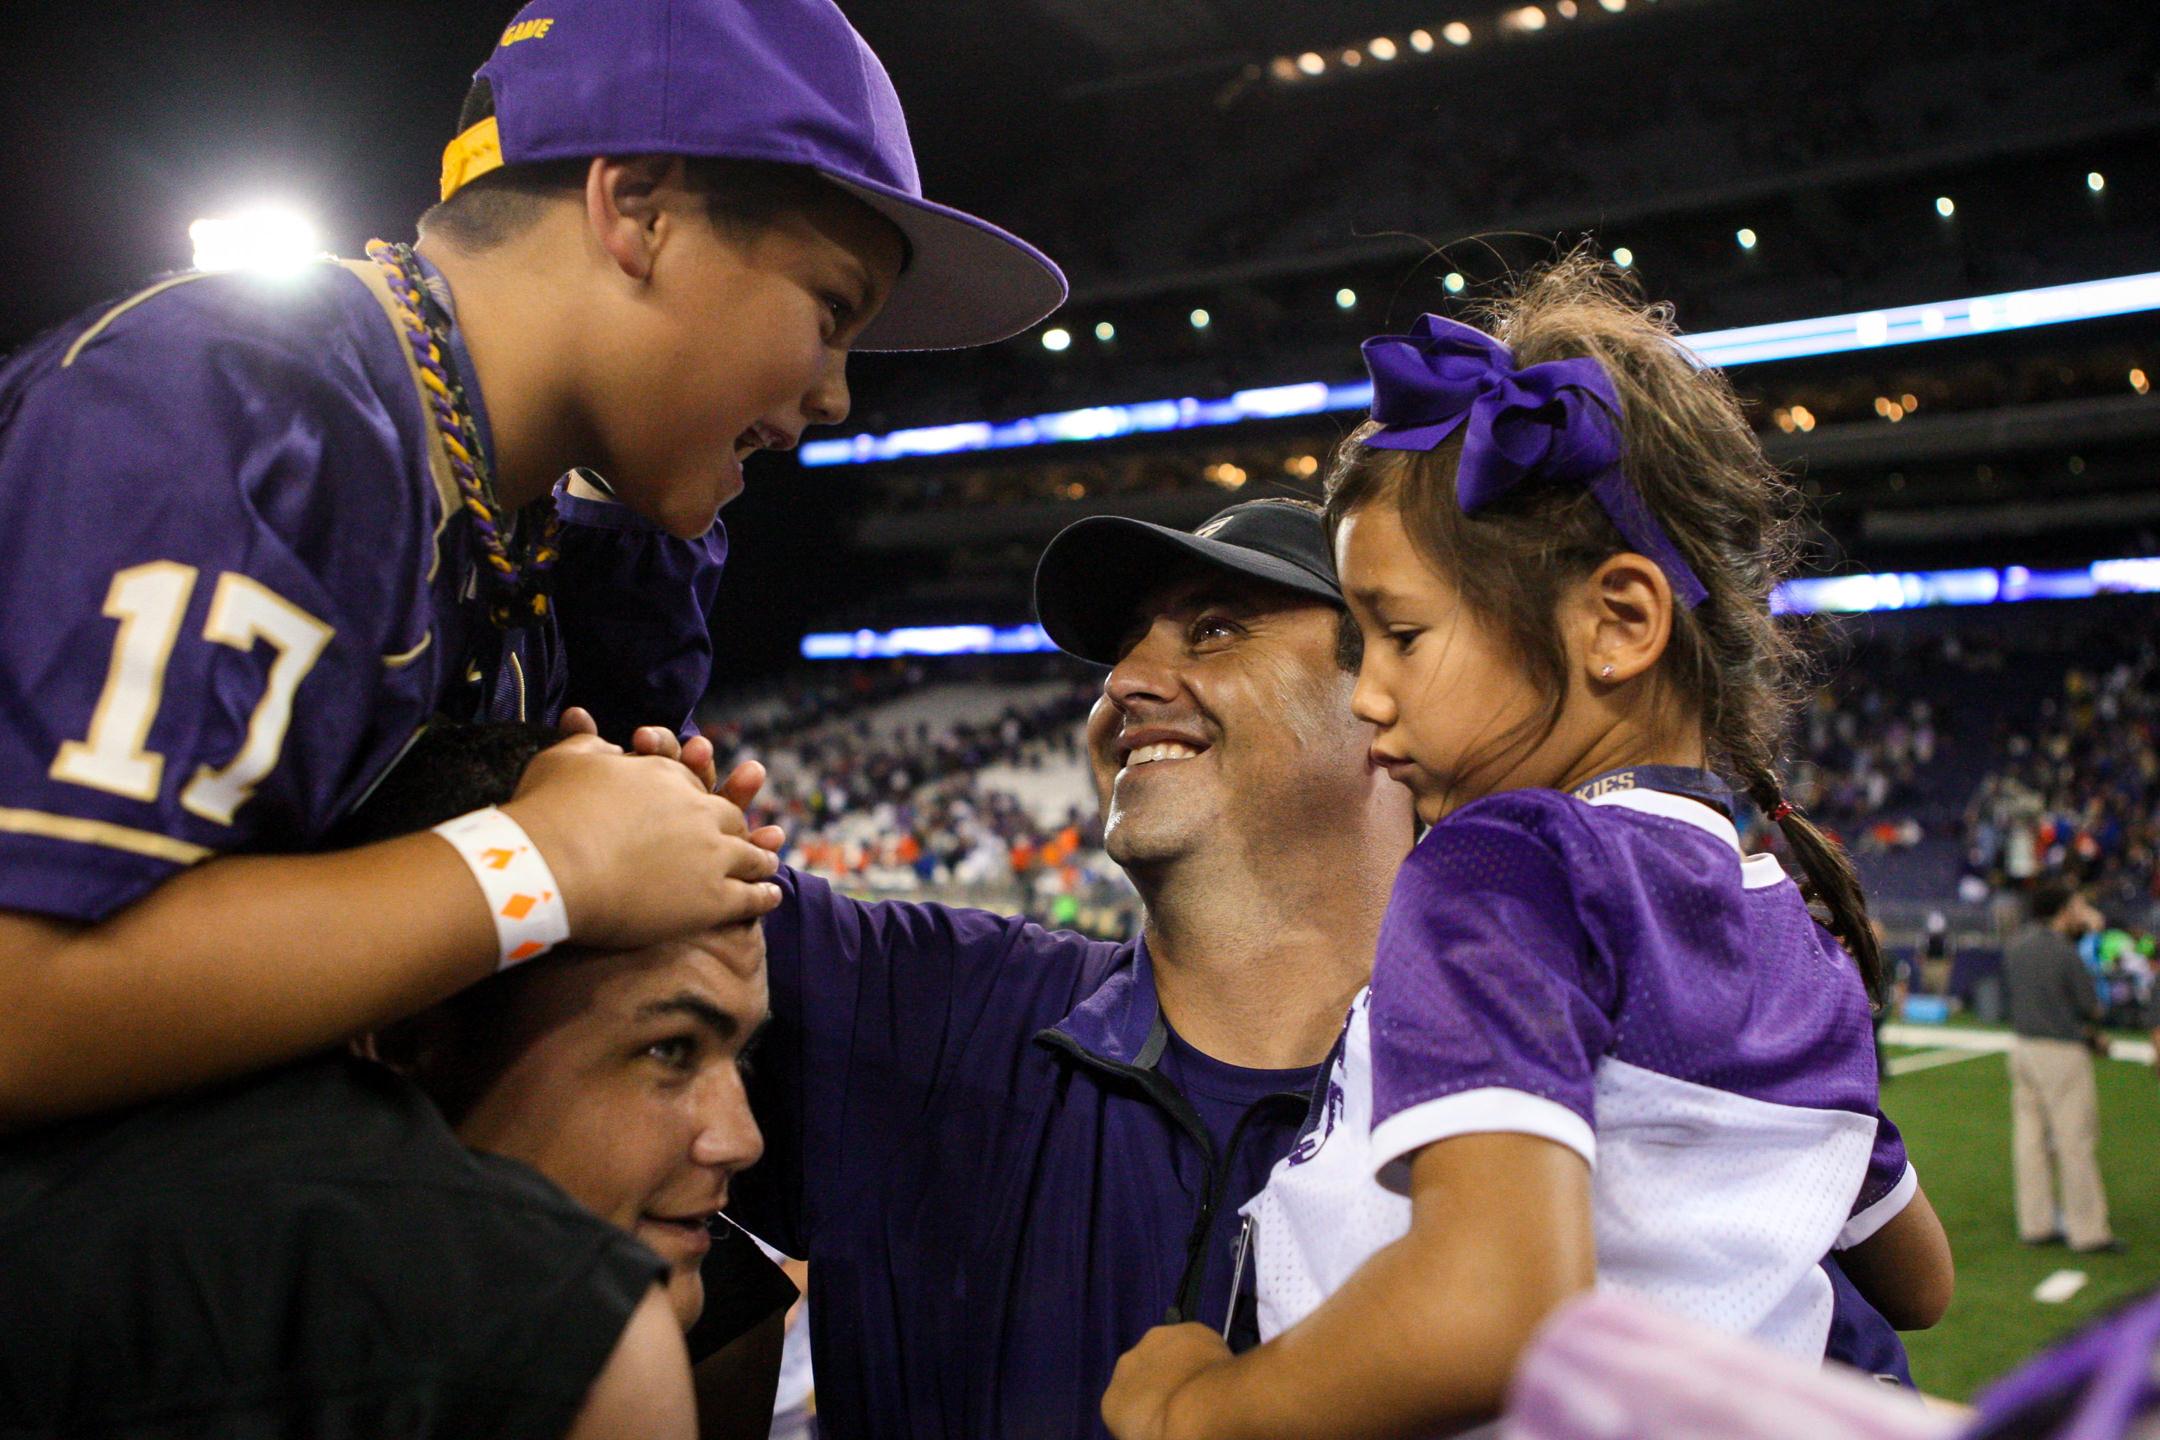 University of Washington Huskies Football Head Coach Steve Sarkisian Celebrates with Kids